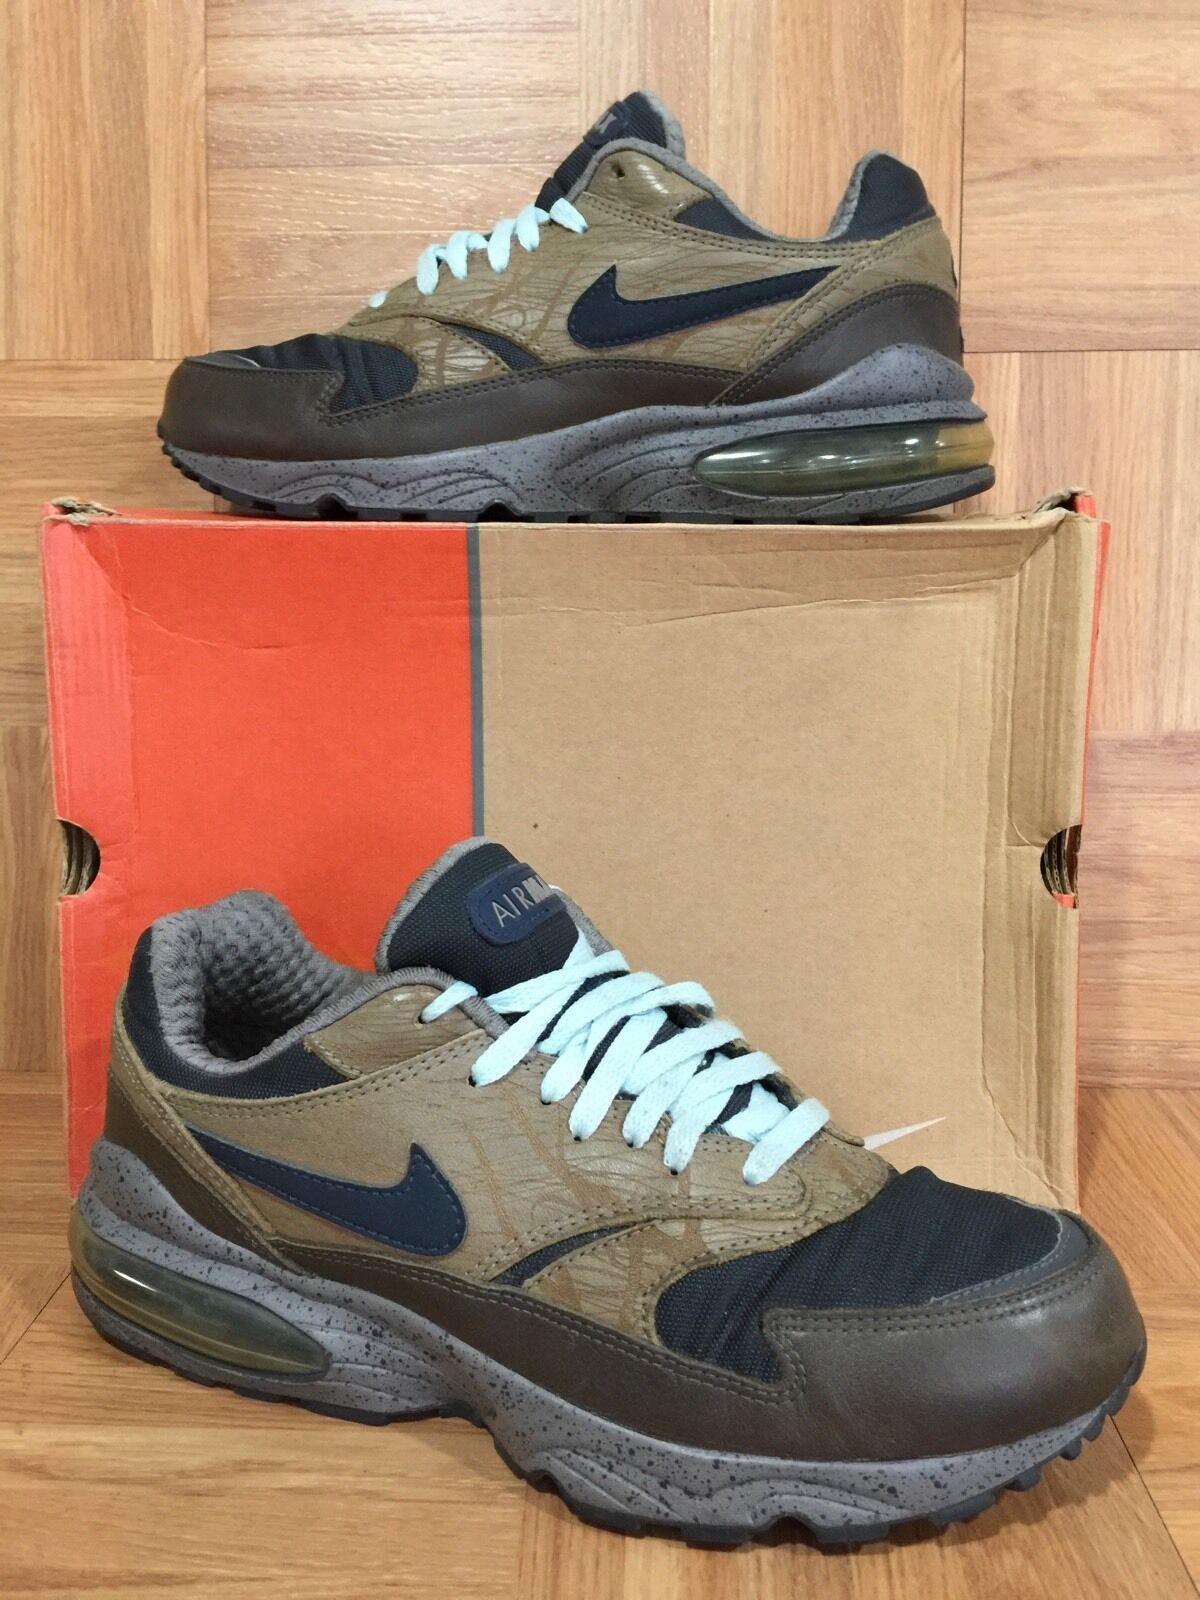 RARE Nike Air Bust Premium Stable Obsidian Fog Iron 10.5 308614-141 Navigation